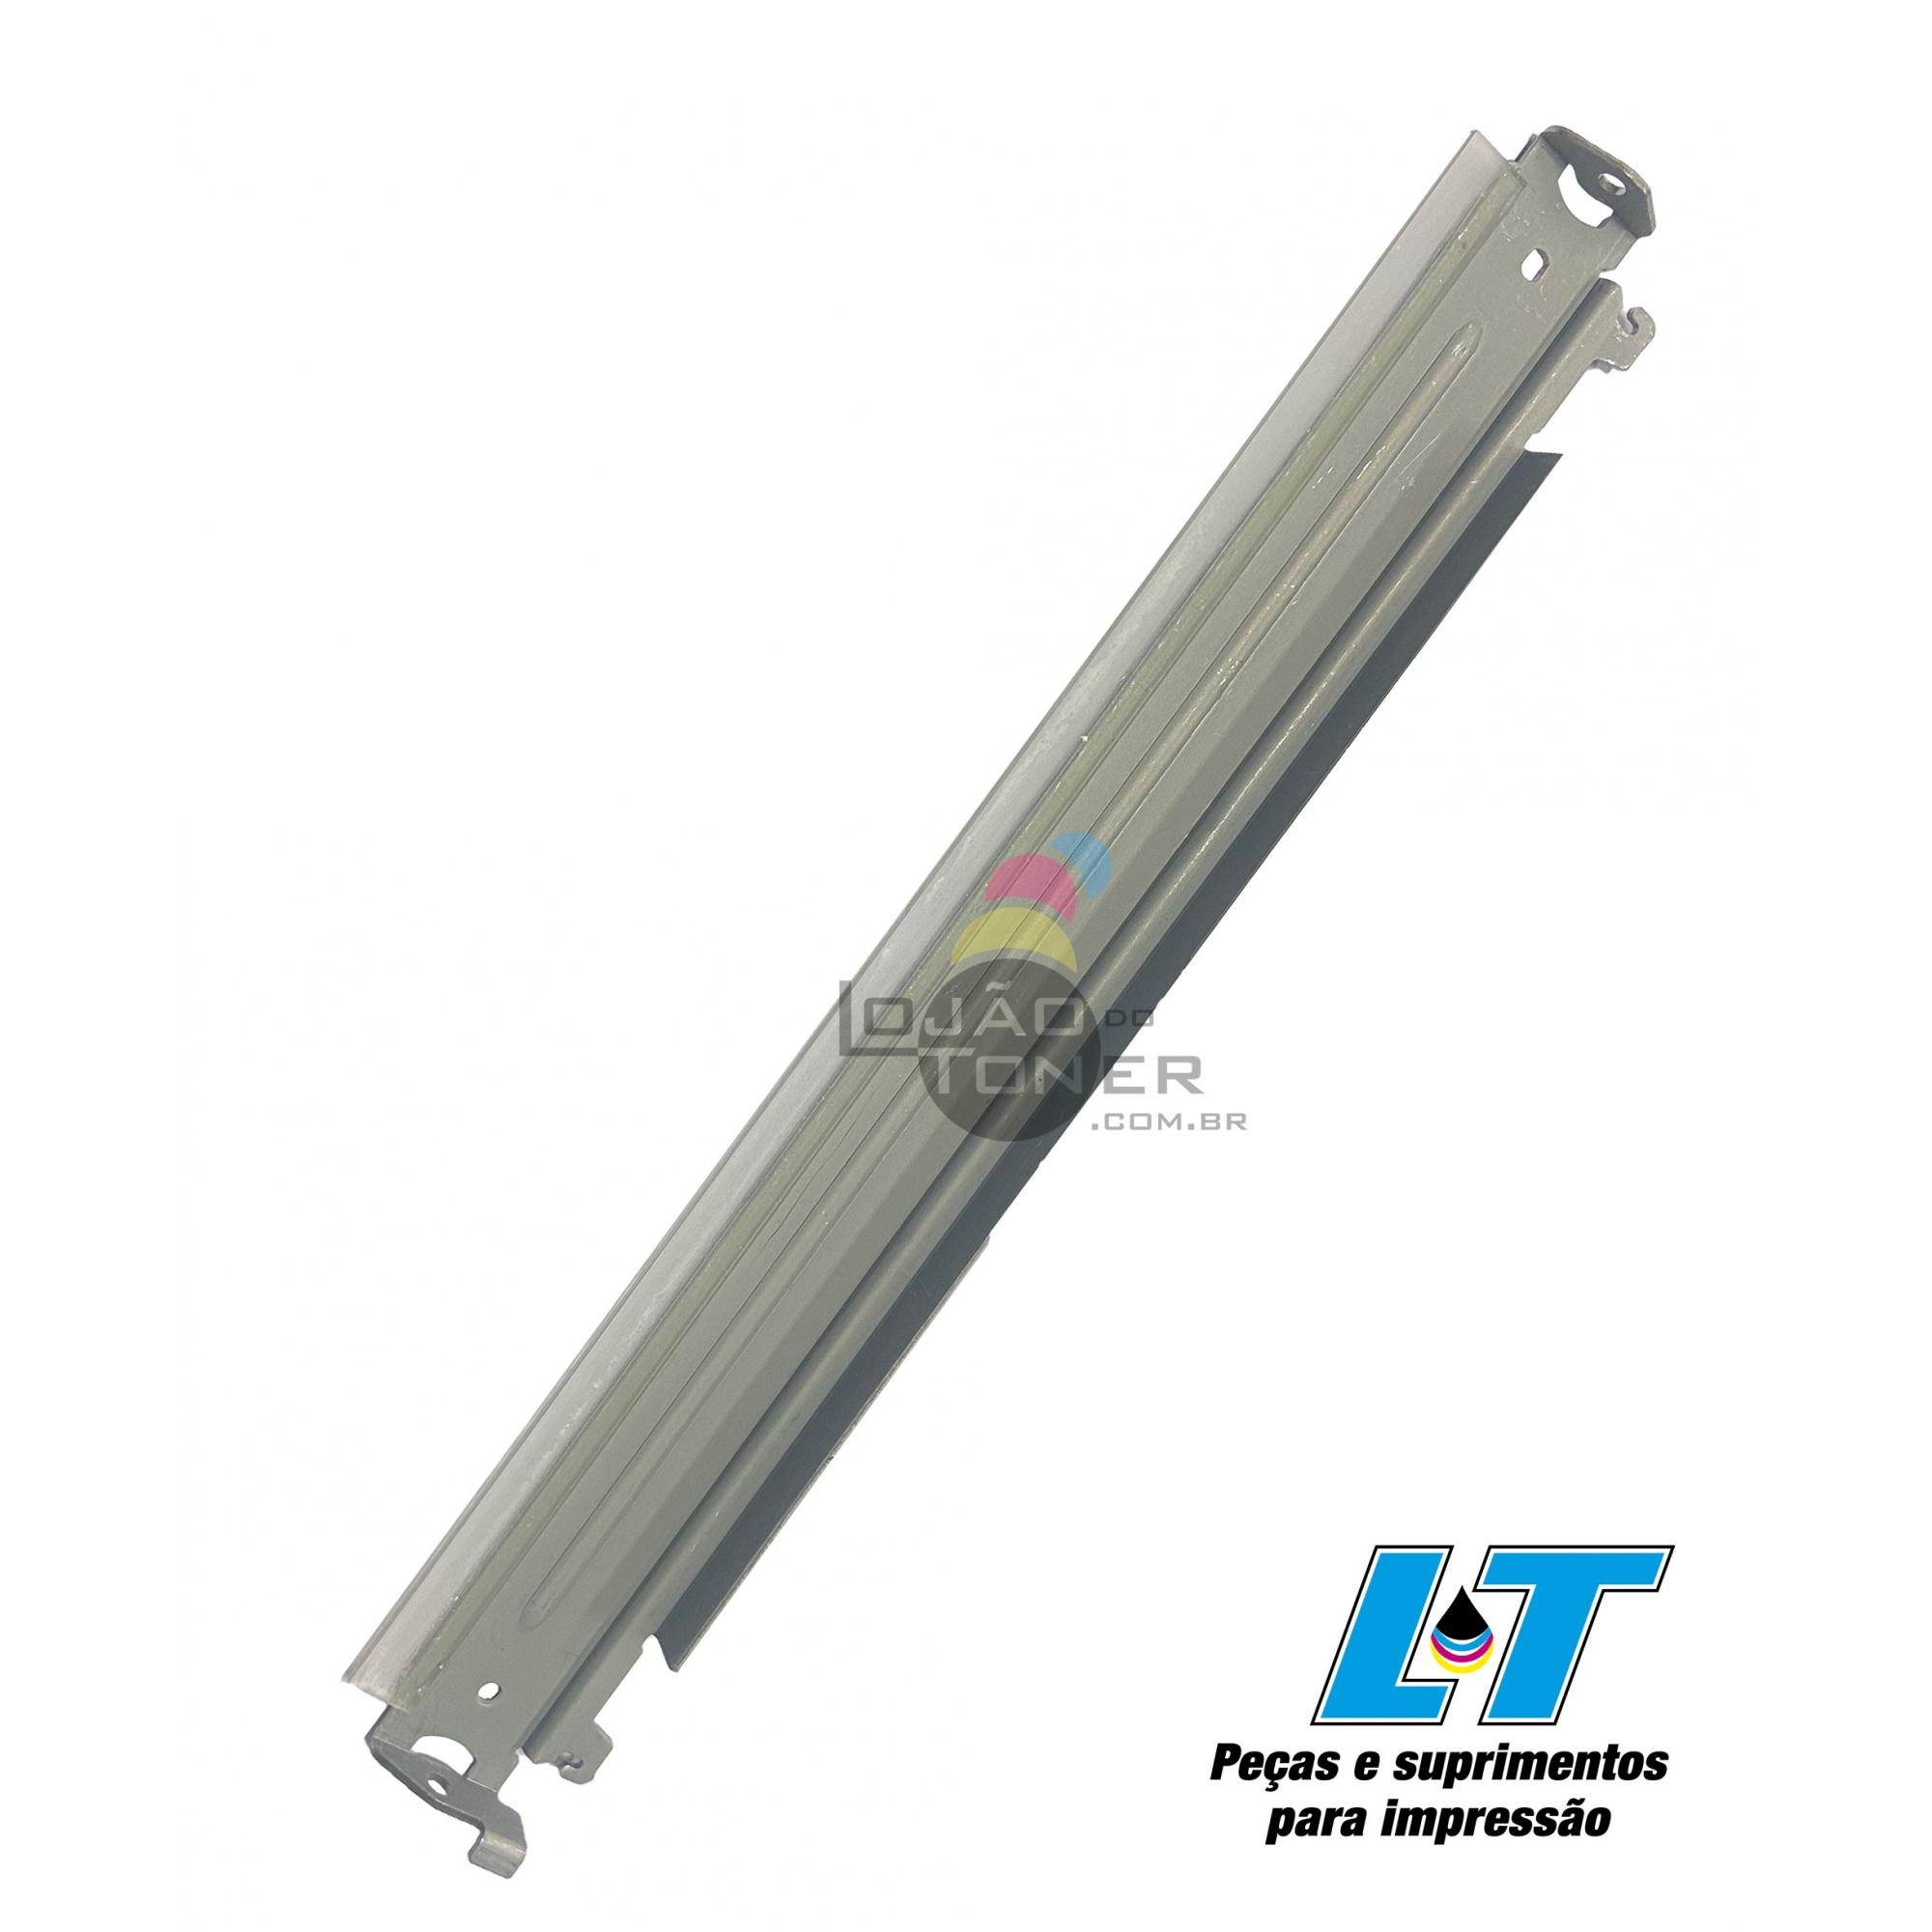 Lâmina de Limpeza da Transferência Ricoh MPC 3002|MPC 3502|MPC 4502| MPC 5502| SPC 830 - Compatível